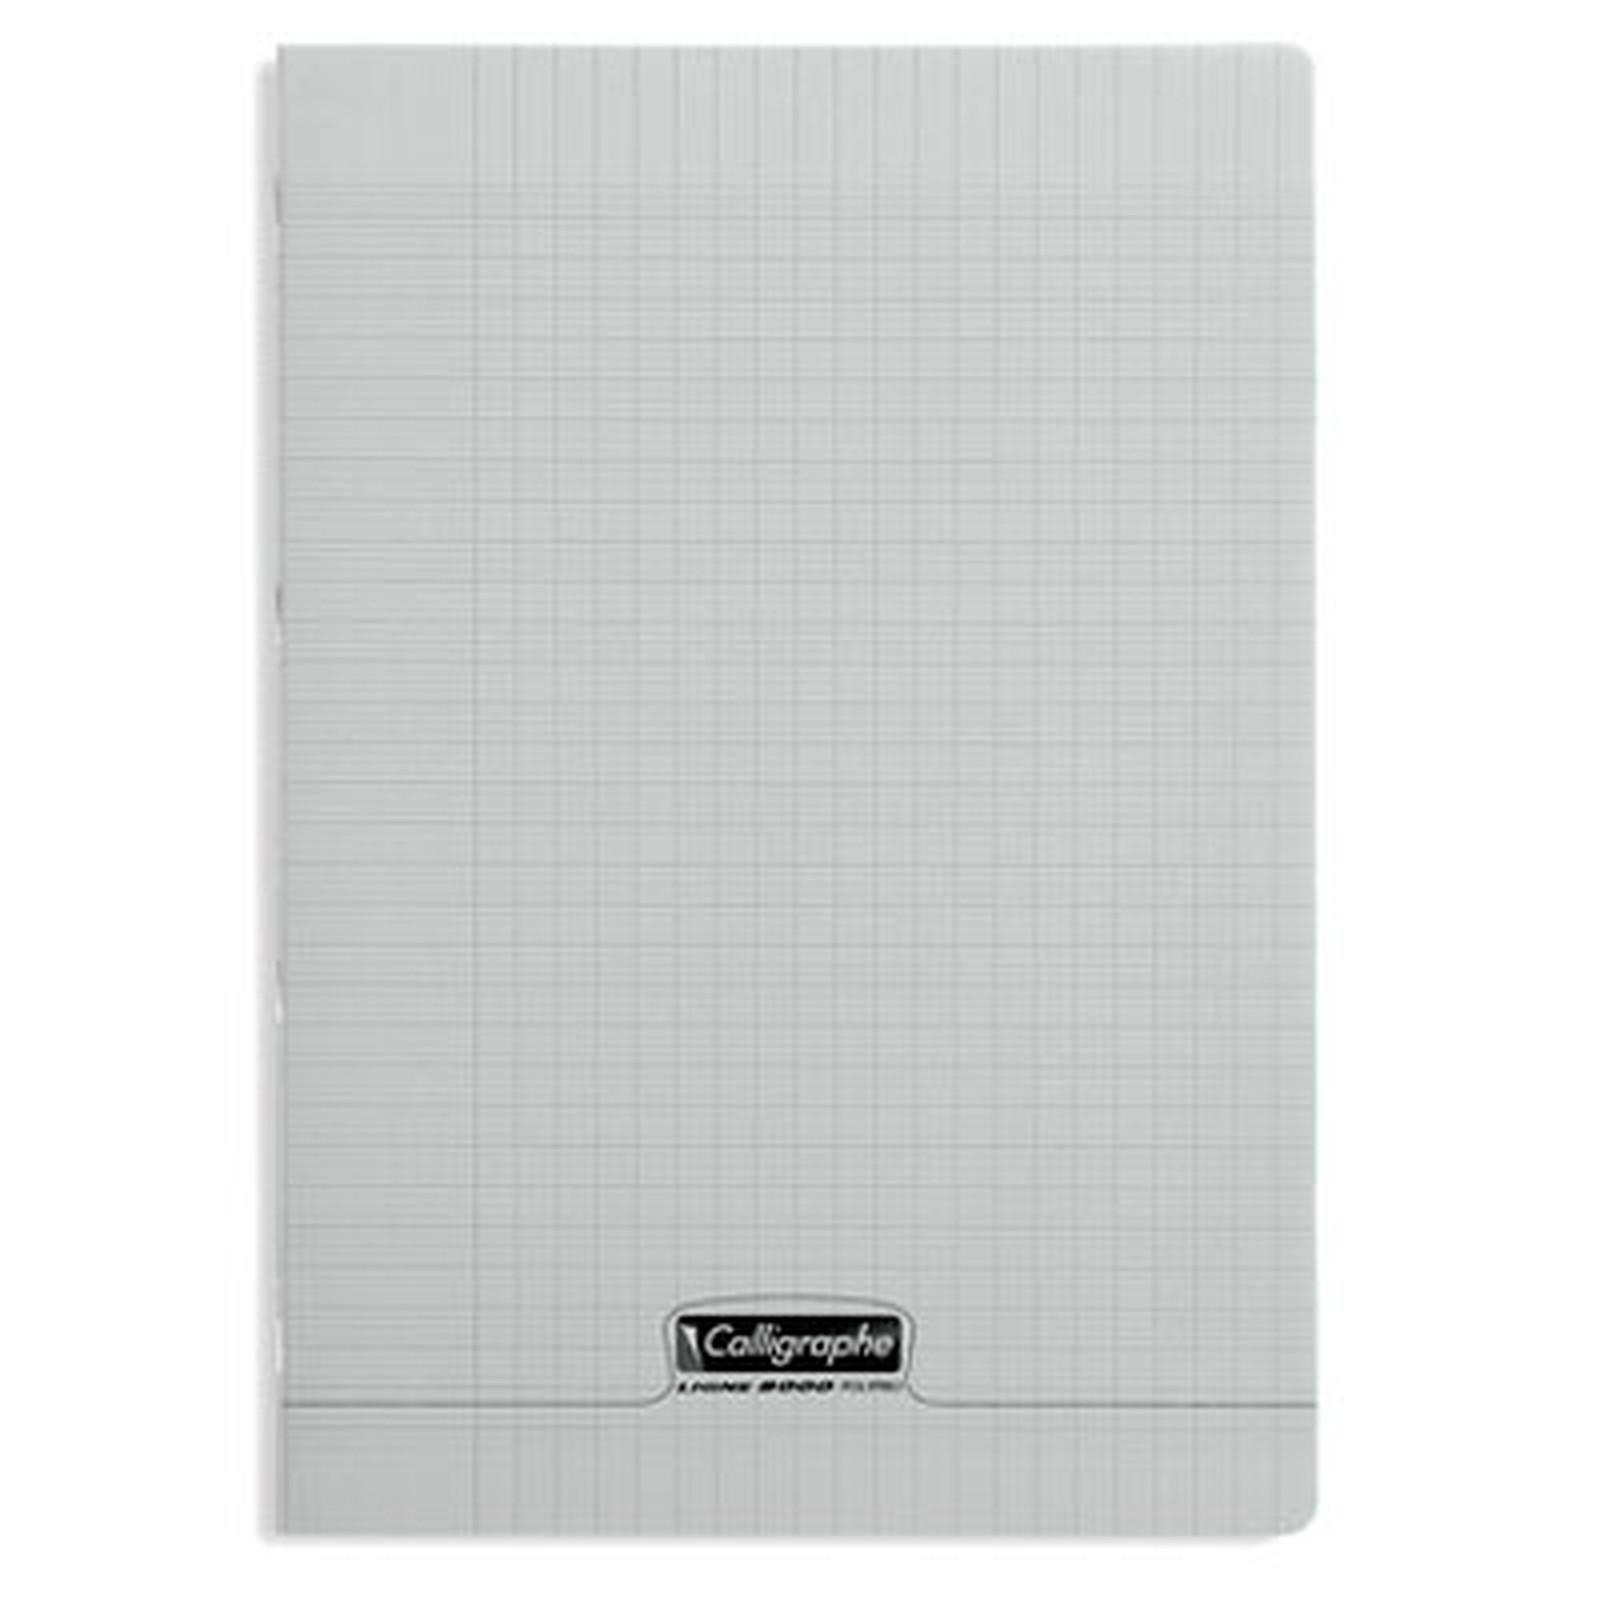 Calligraphe 8000 Polypro Cahier 96 pages 21 x 29.7 cm seyes grands carreaux Gris